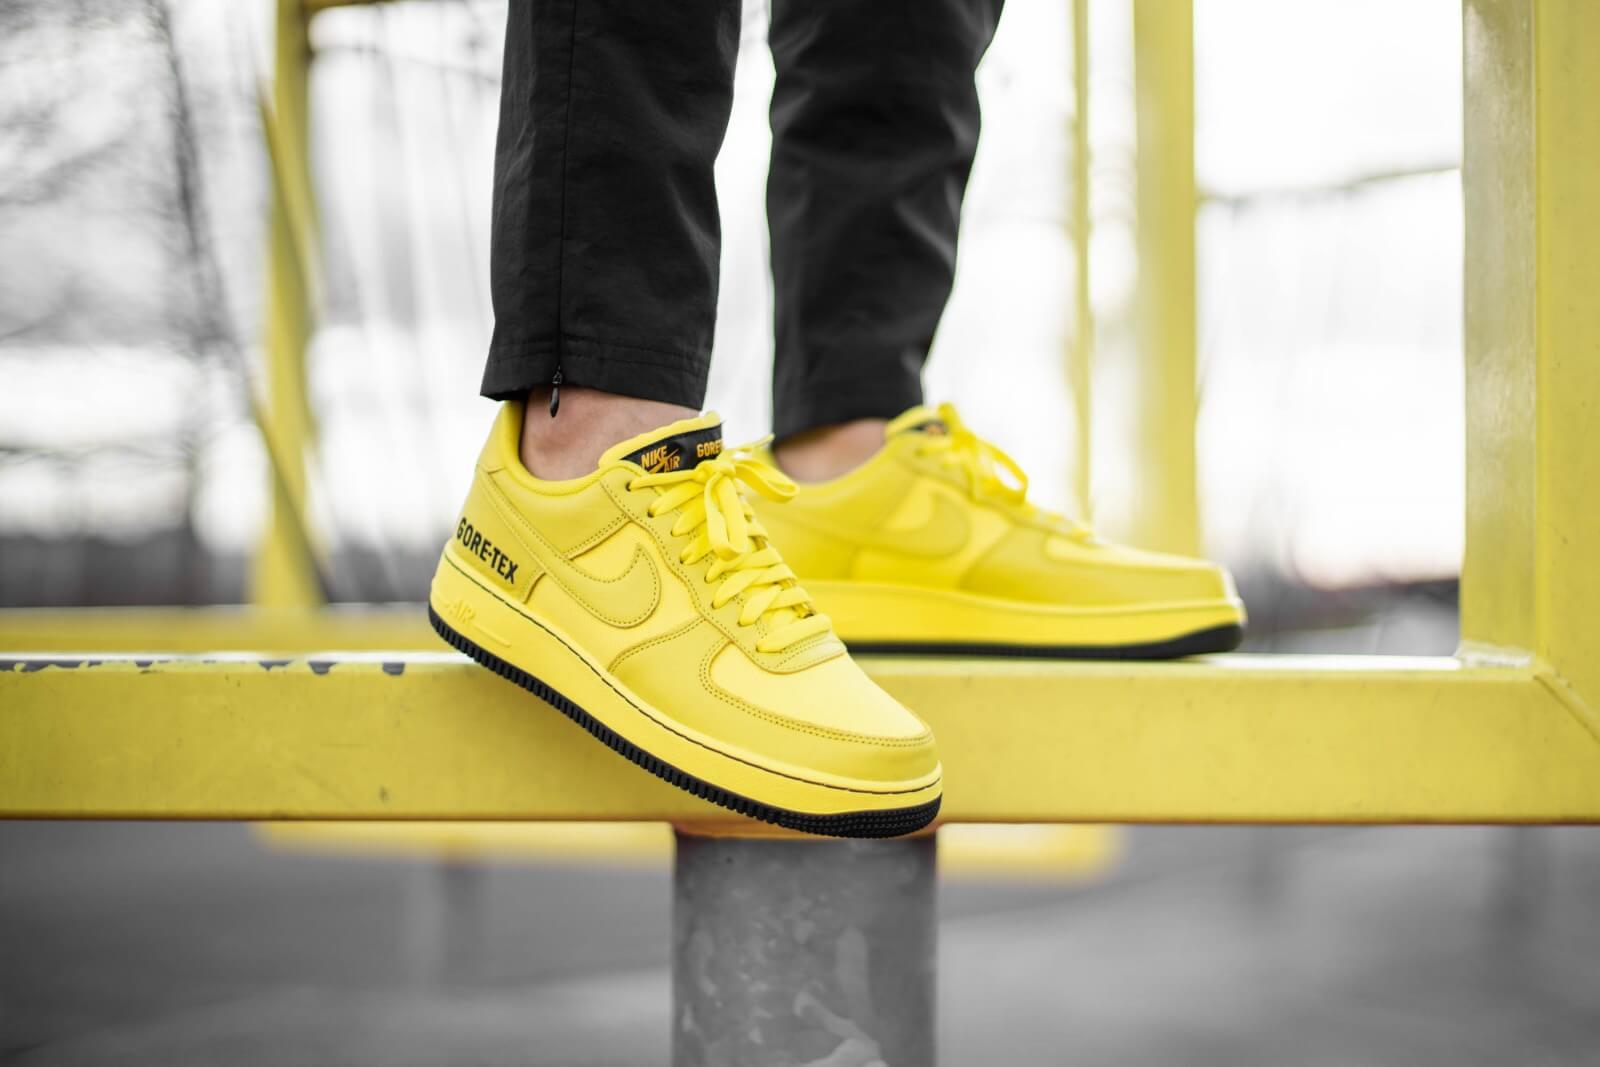 CK2630 701 Nike Air Force 1 Gore Tex Dynamic YellowBlack